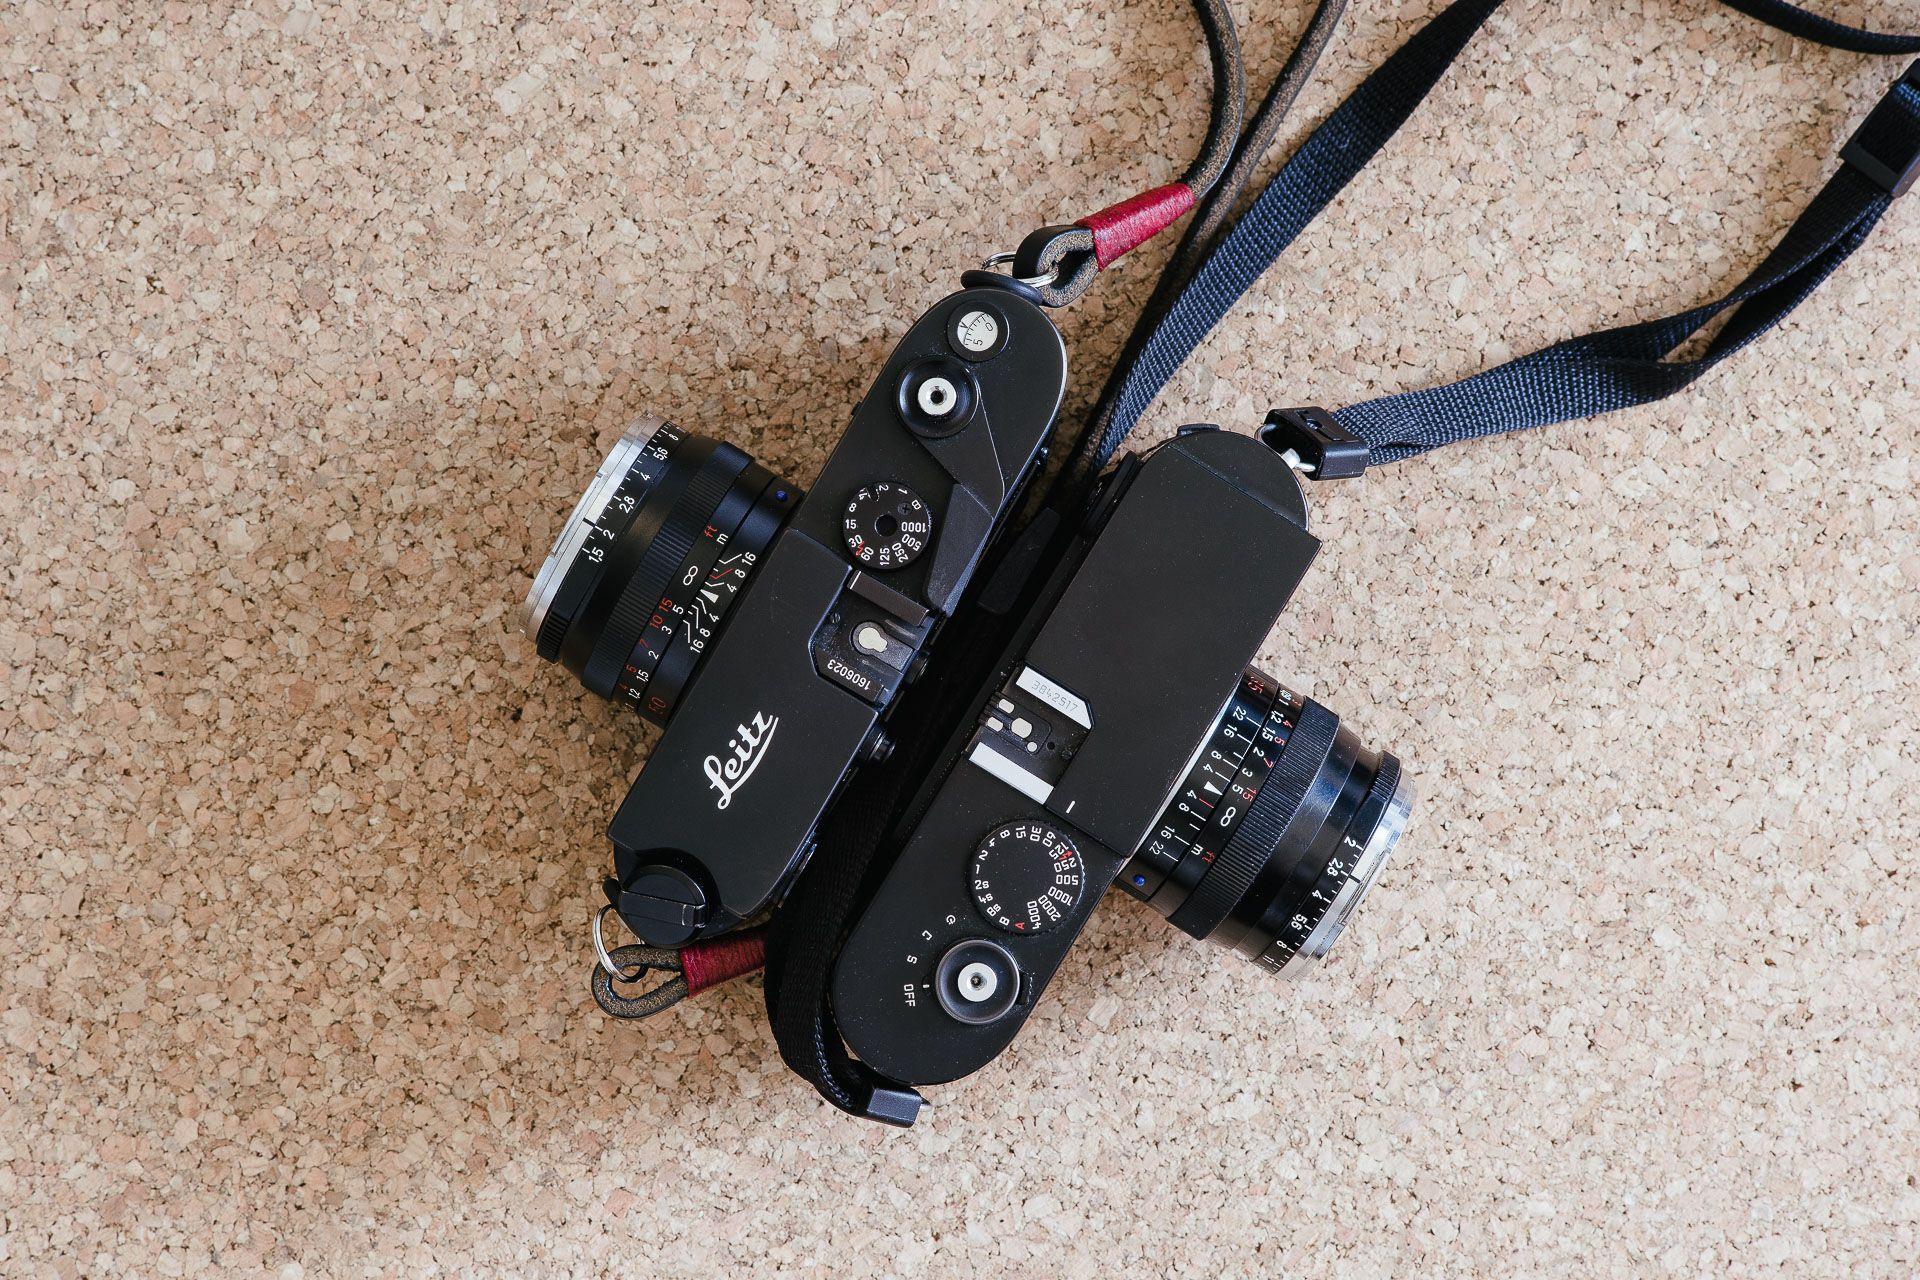 Großartig Full Frame Entfernungsmesser Digital Bilder ...